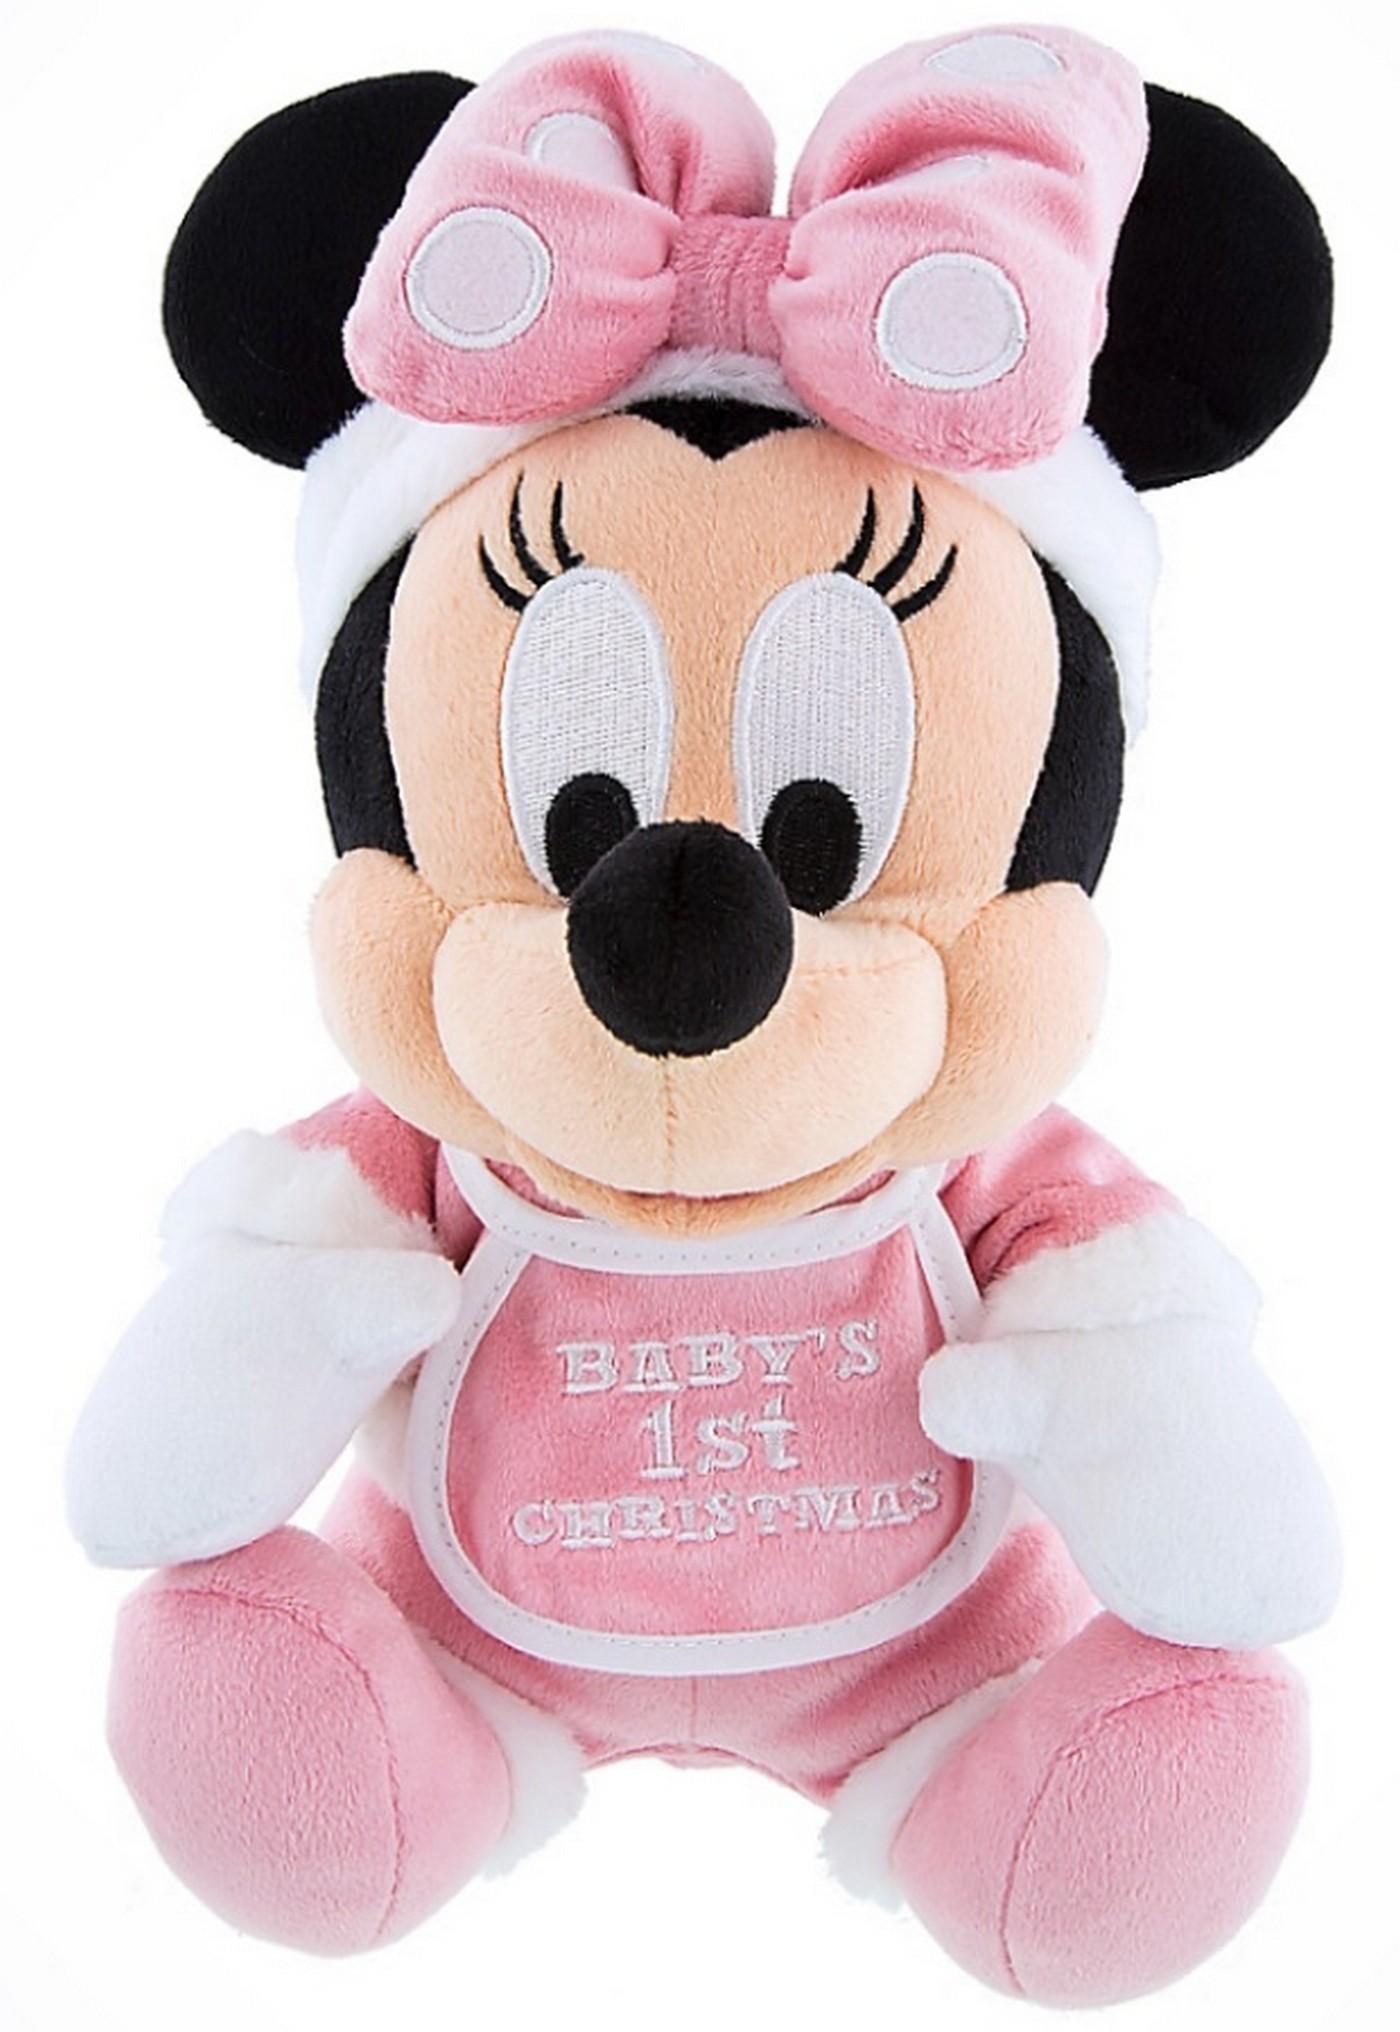 Disney Santa Minnie Baby's First Christmas 9inch Soft Plush © Dizdude.com